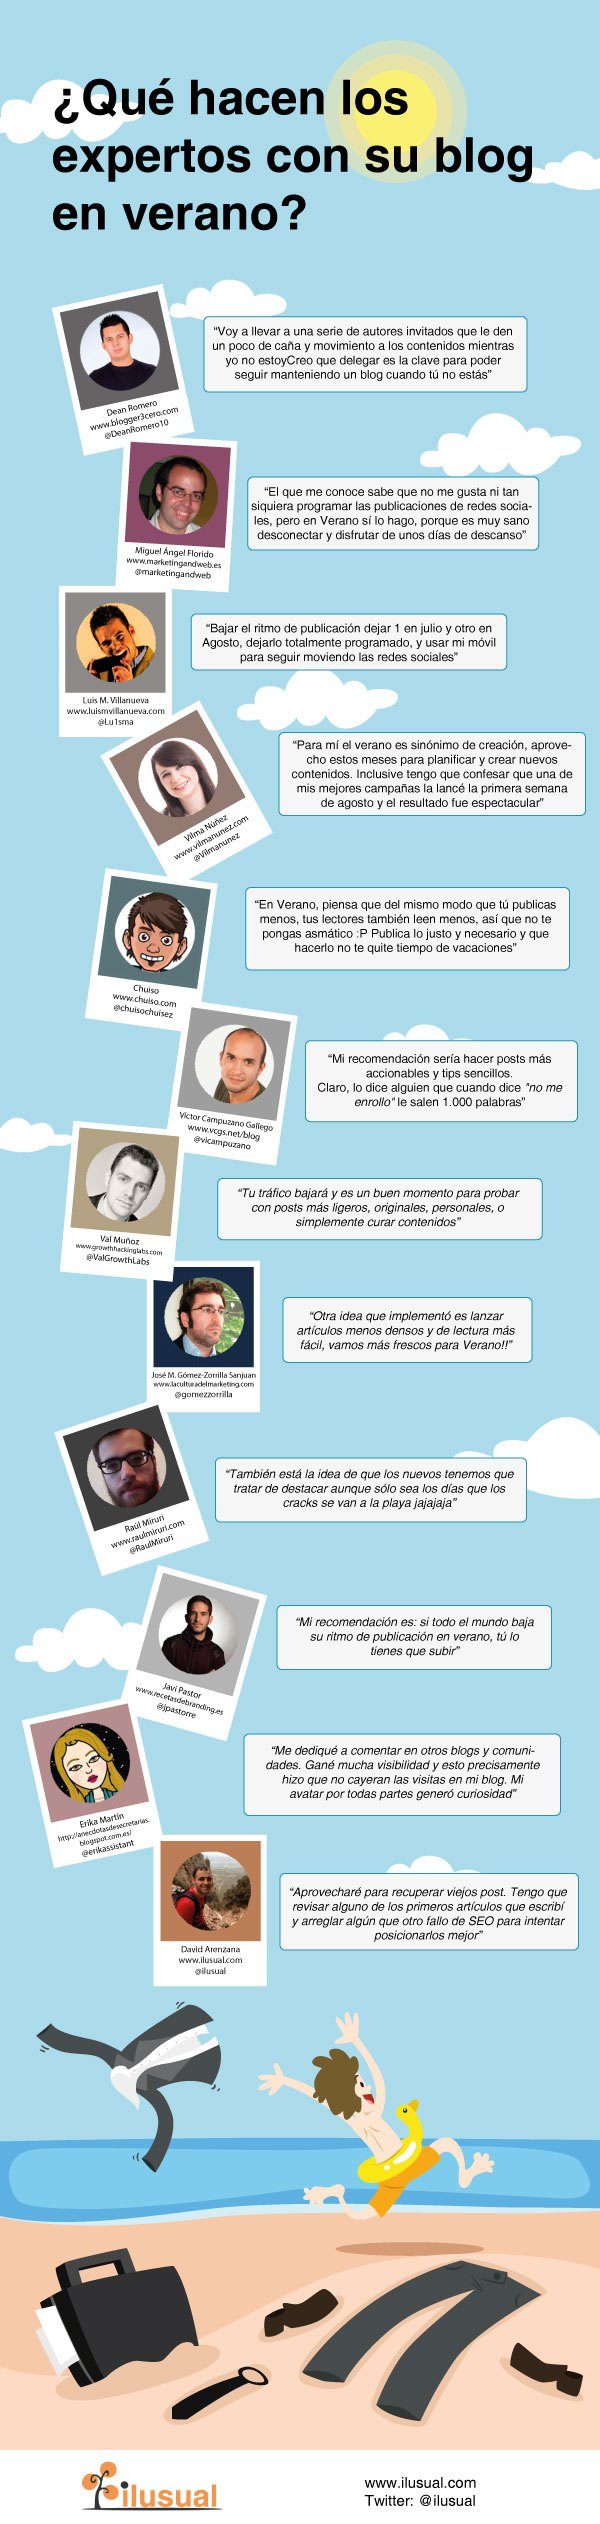 blog-verano-infografia